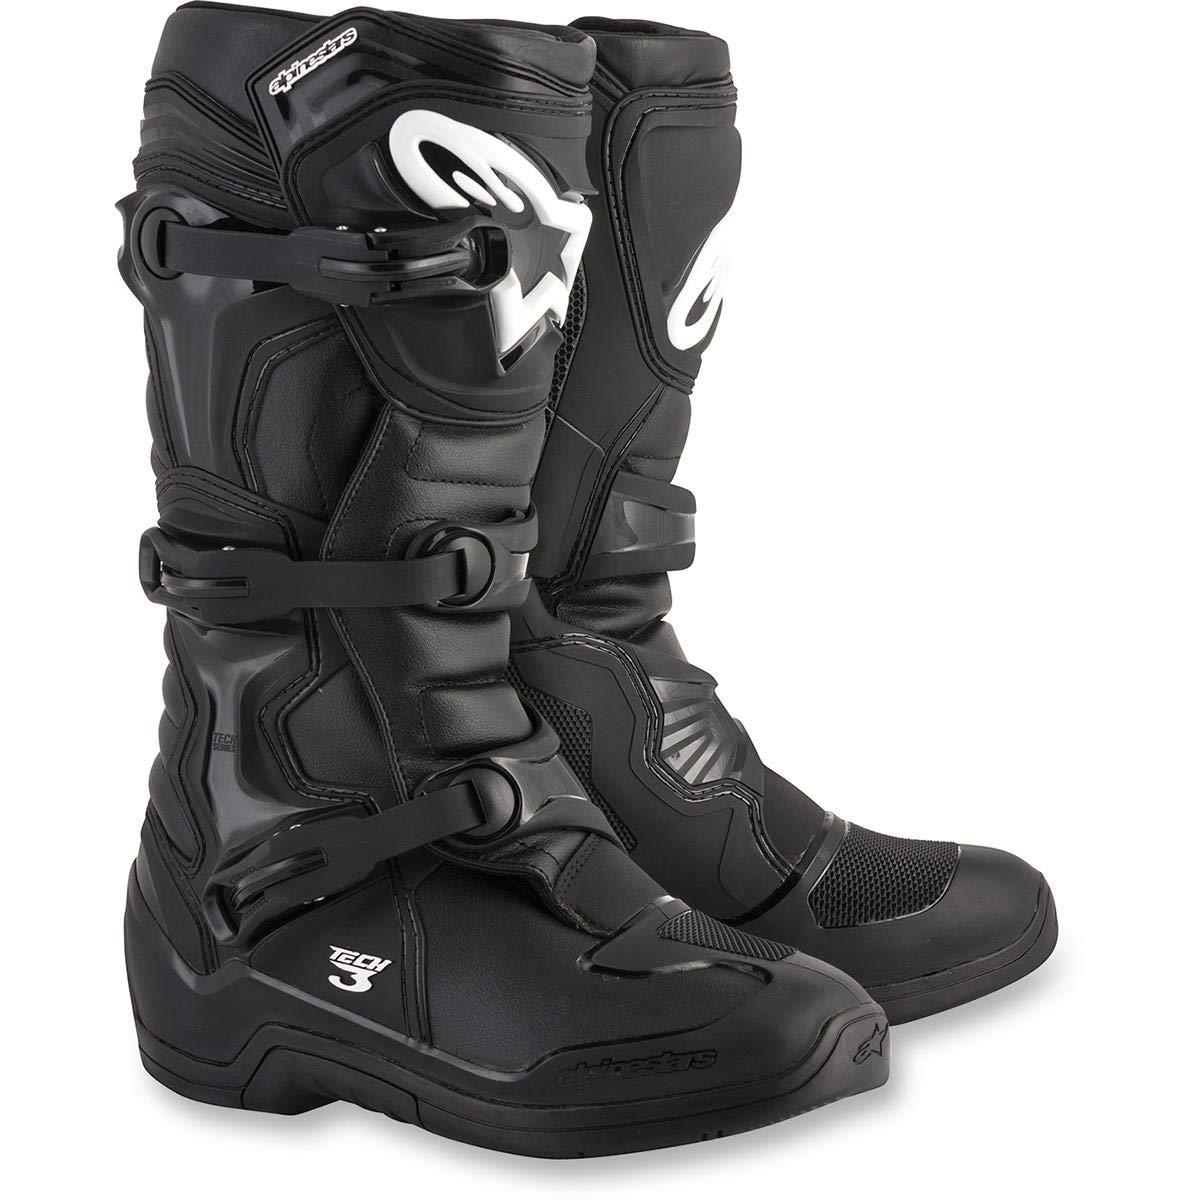 Alpinestars Tech 3 Mens MX Offroad Boots Black 12 USA